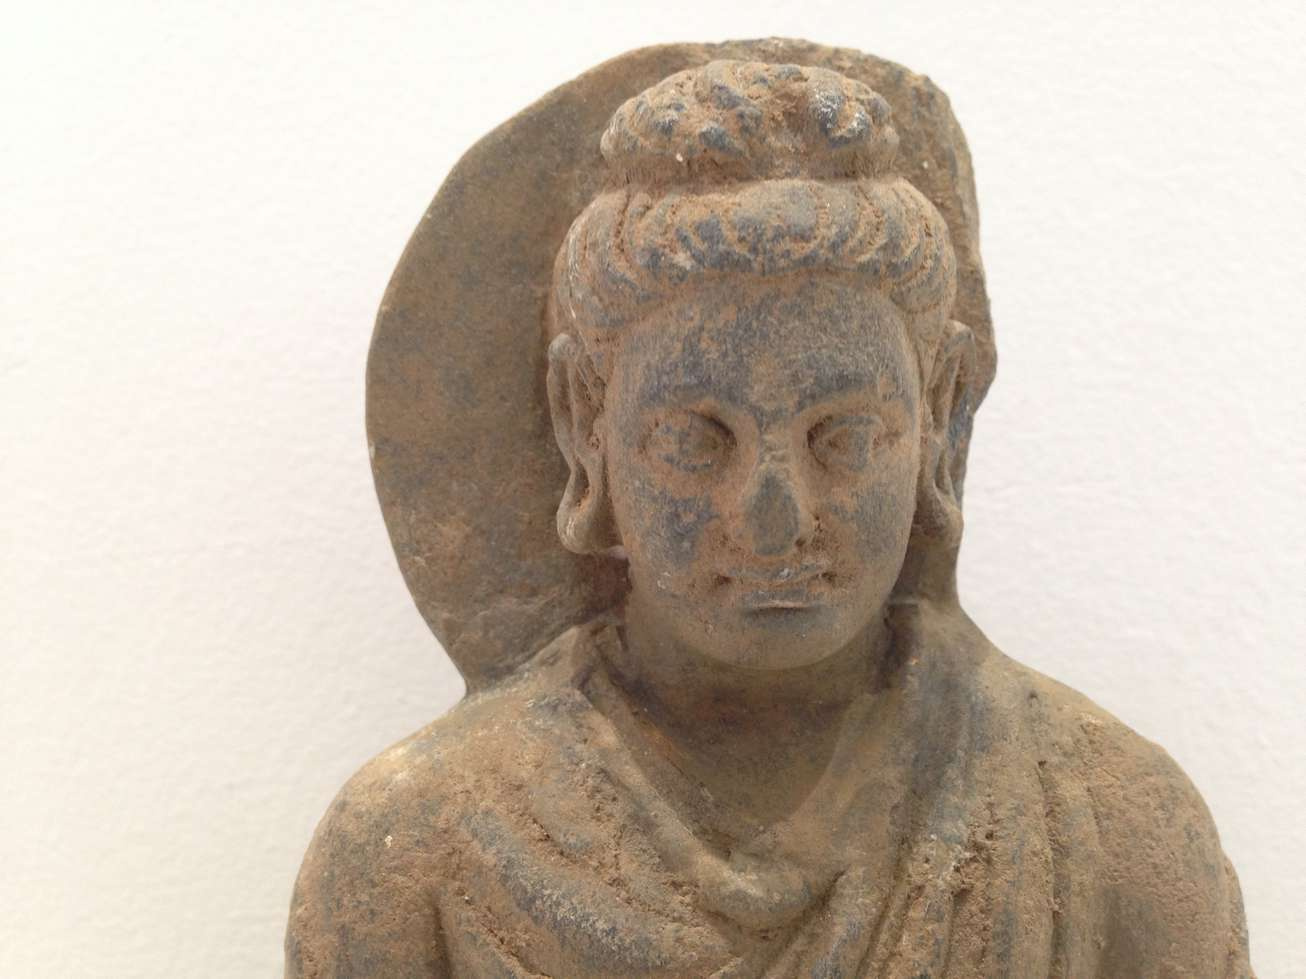 bouddha-comblement-metal-asie-art-ancien-reparation-restaurateur-invisible-restaurarte.jpg